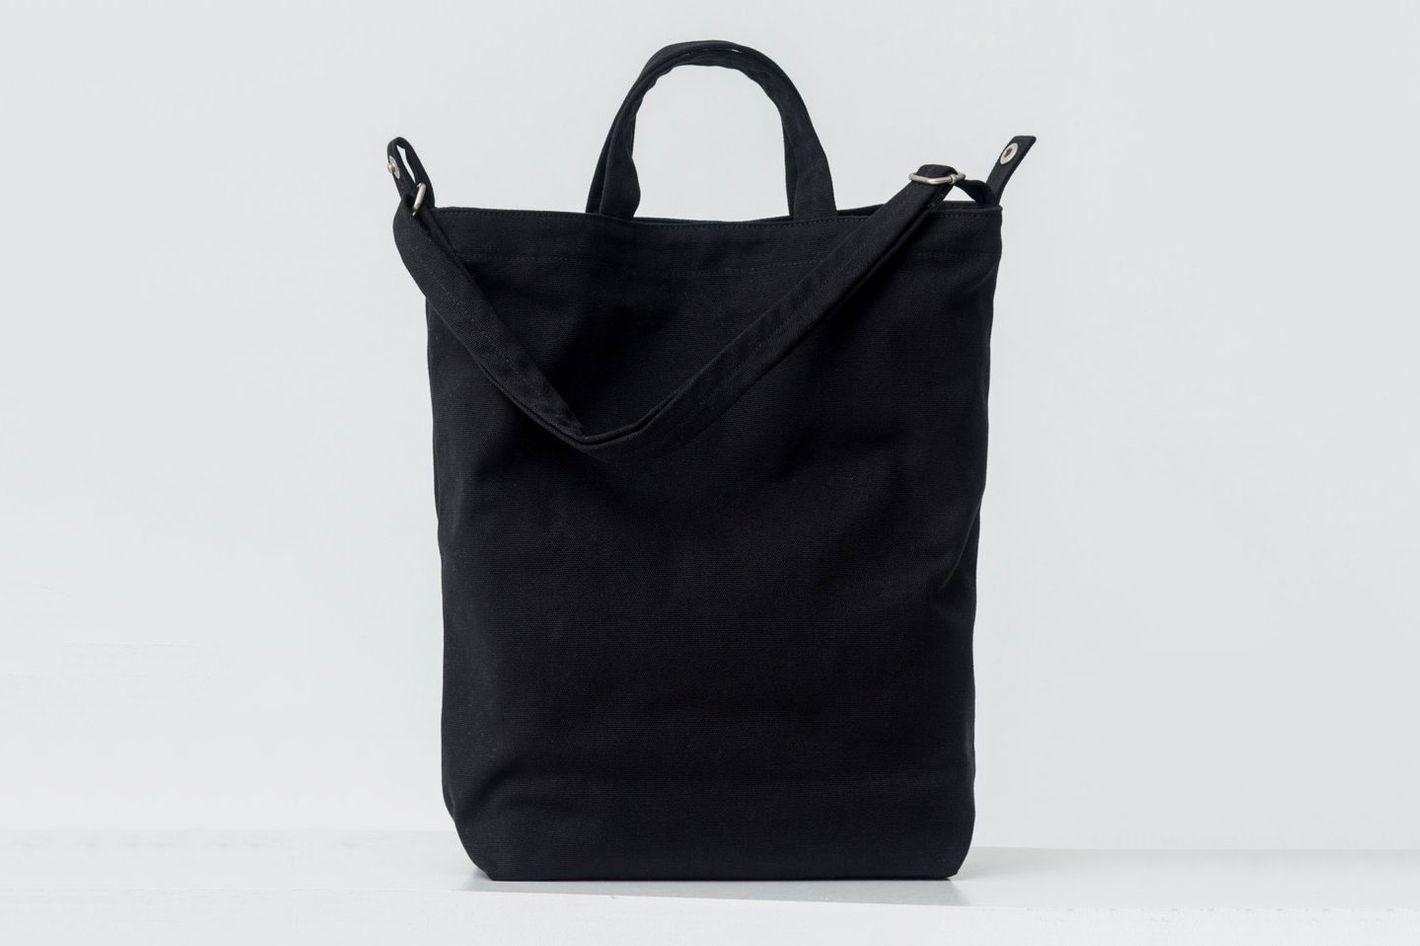 82132bae2c93 12 Best Work Bags Reviewed by Our Editors 2018